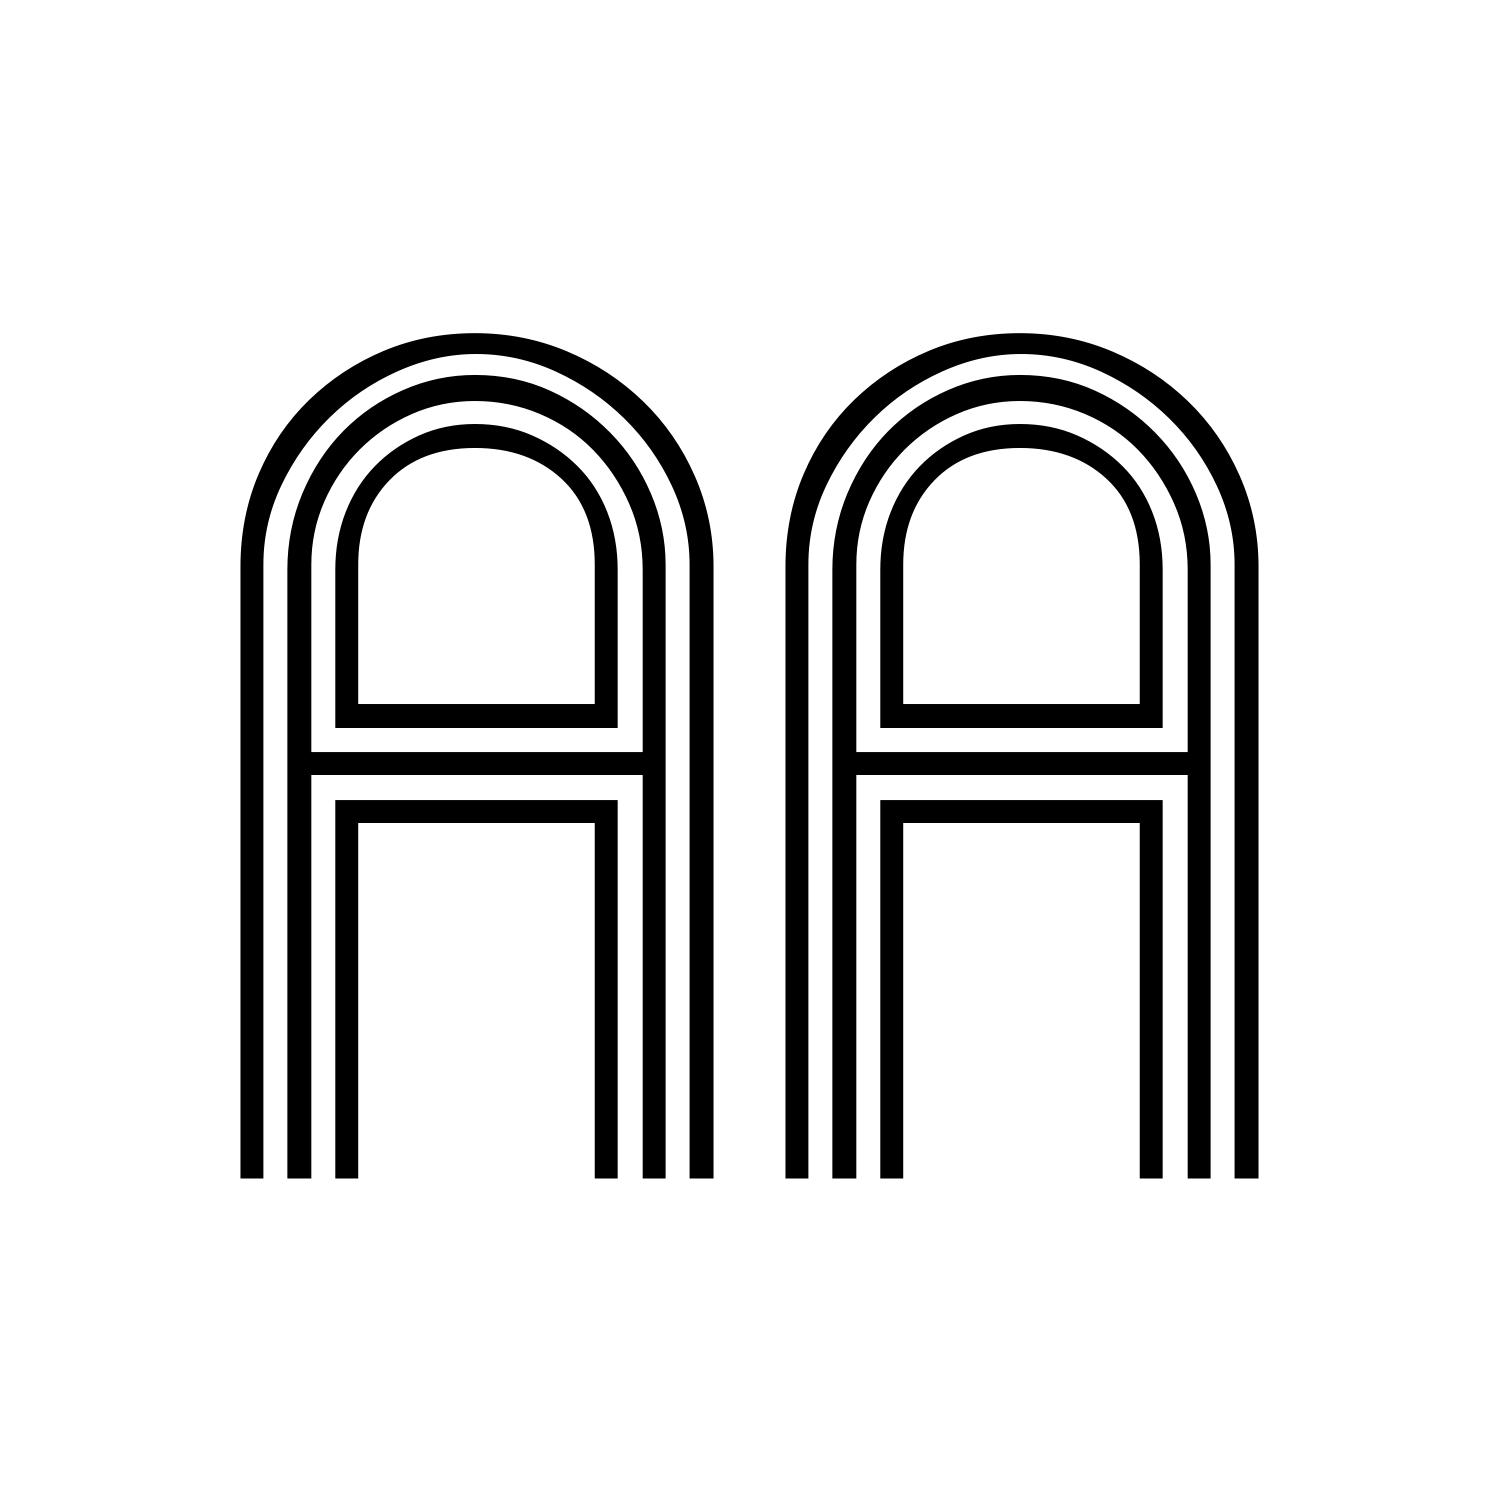 15 Striped Line Font Images - Retro Striped Line Font, Retro